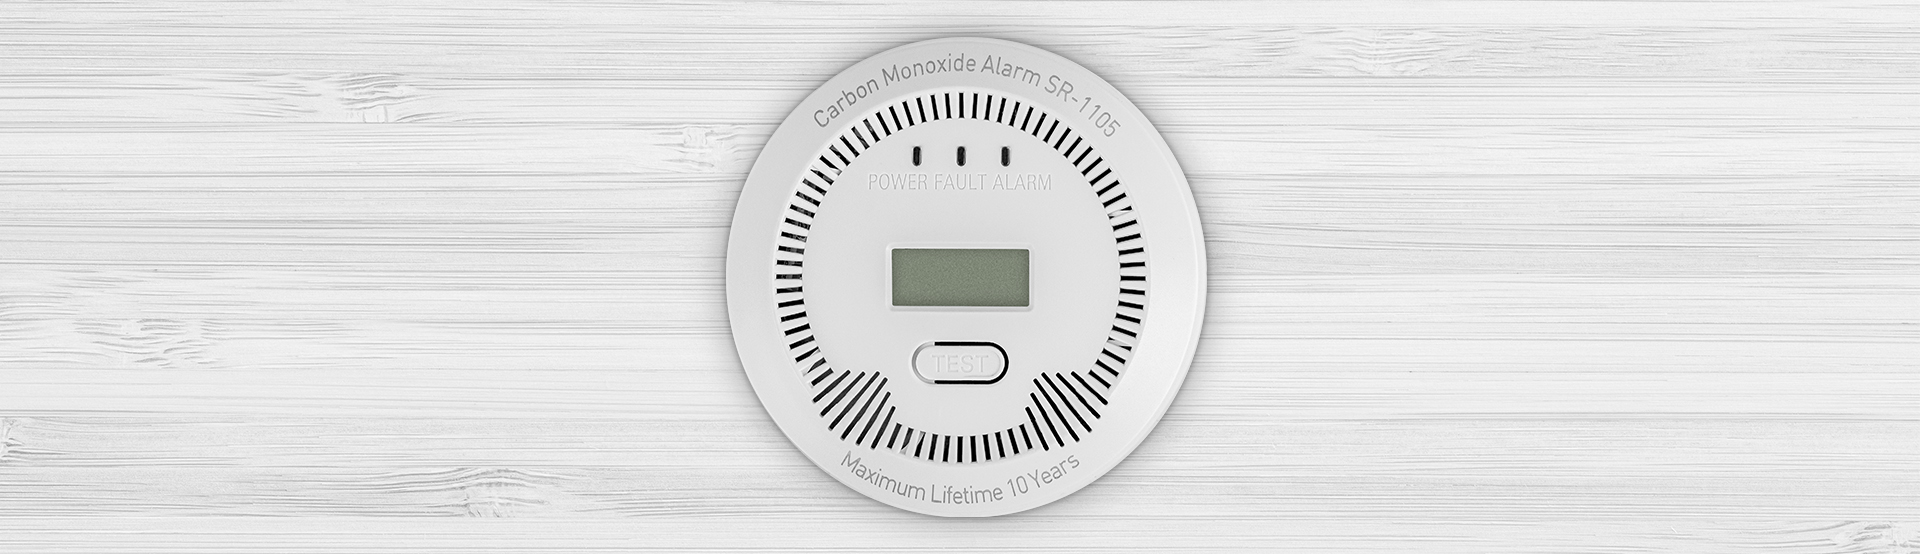 co (carbon monoxide) detector lanberg indoor +bulit-in thermometer 6